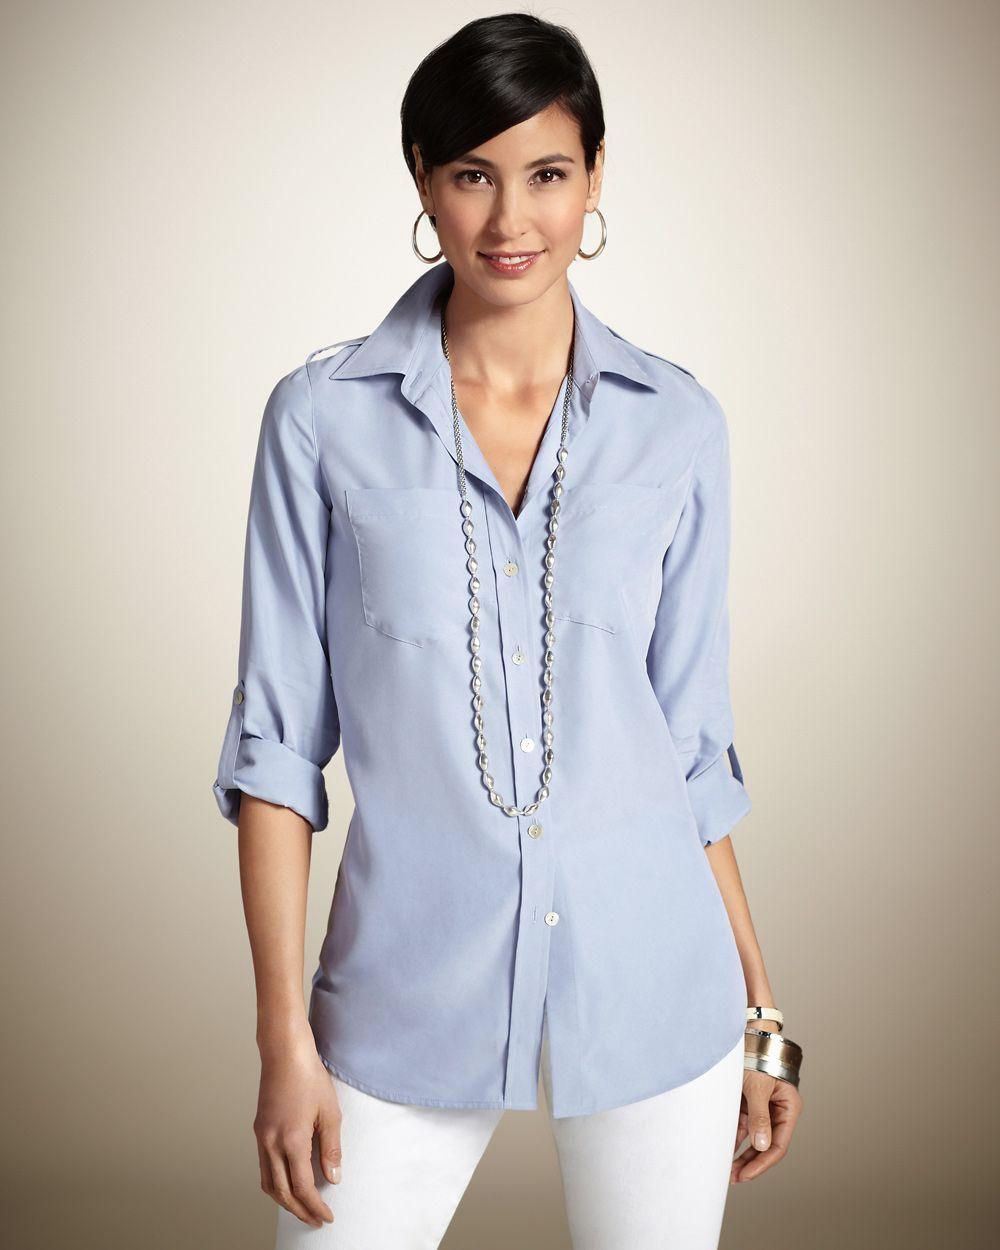 Chico's Women's Secret Silk Utility Shirt